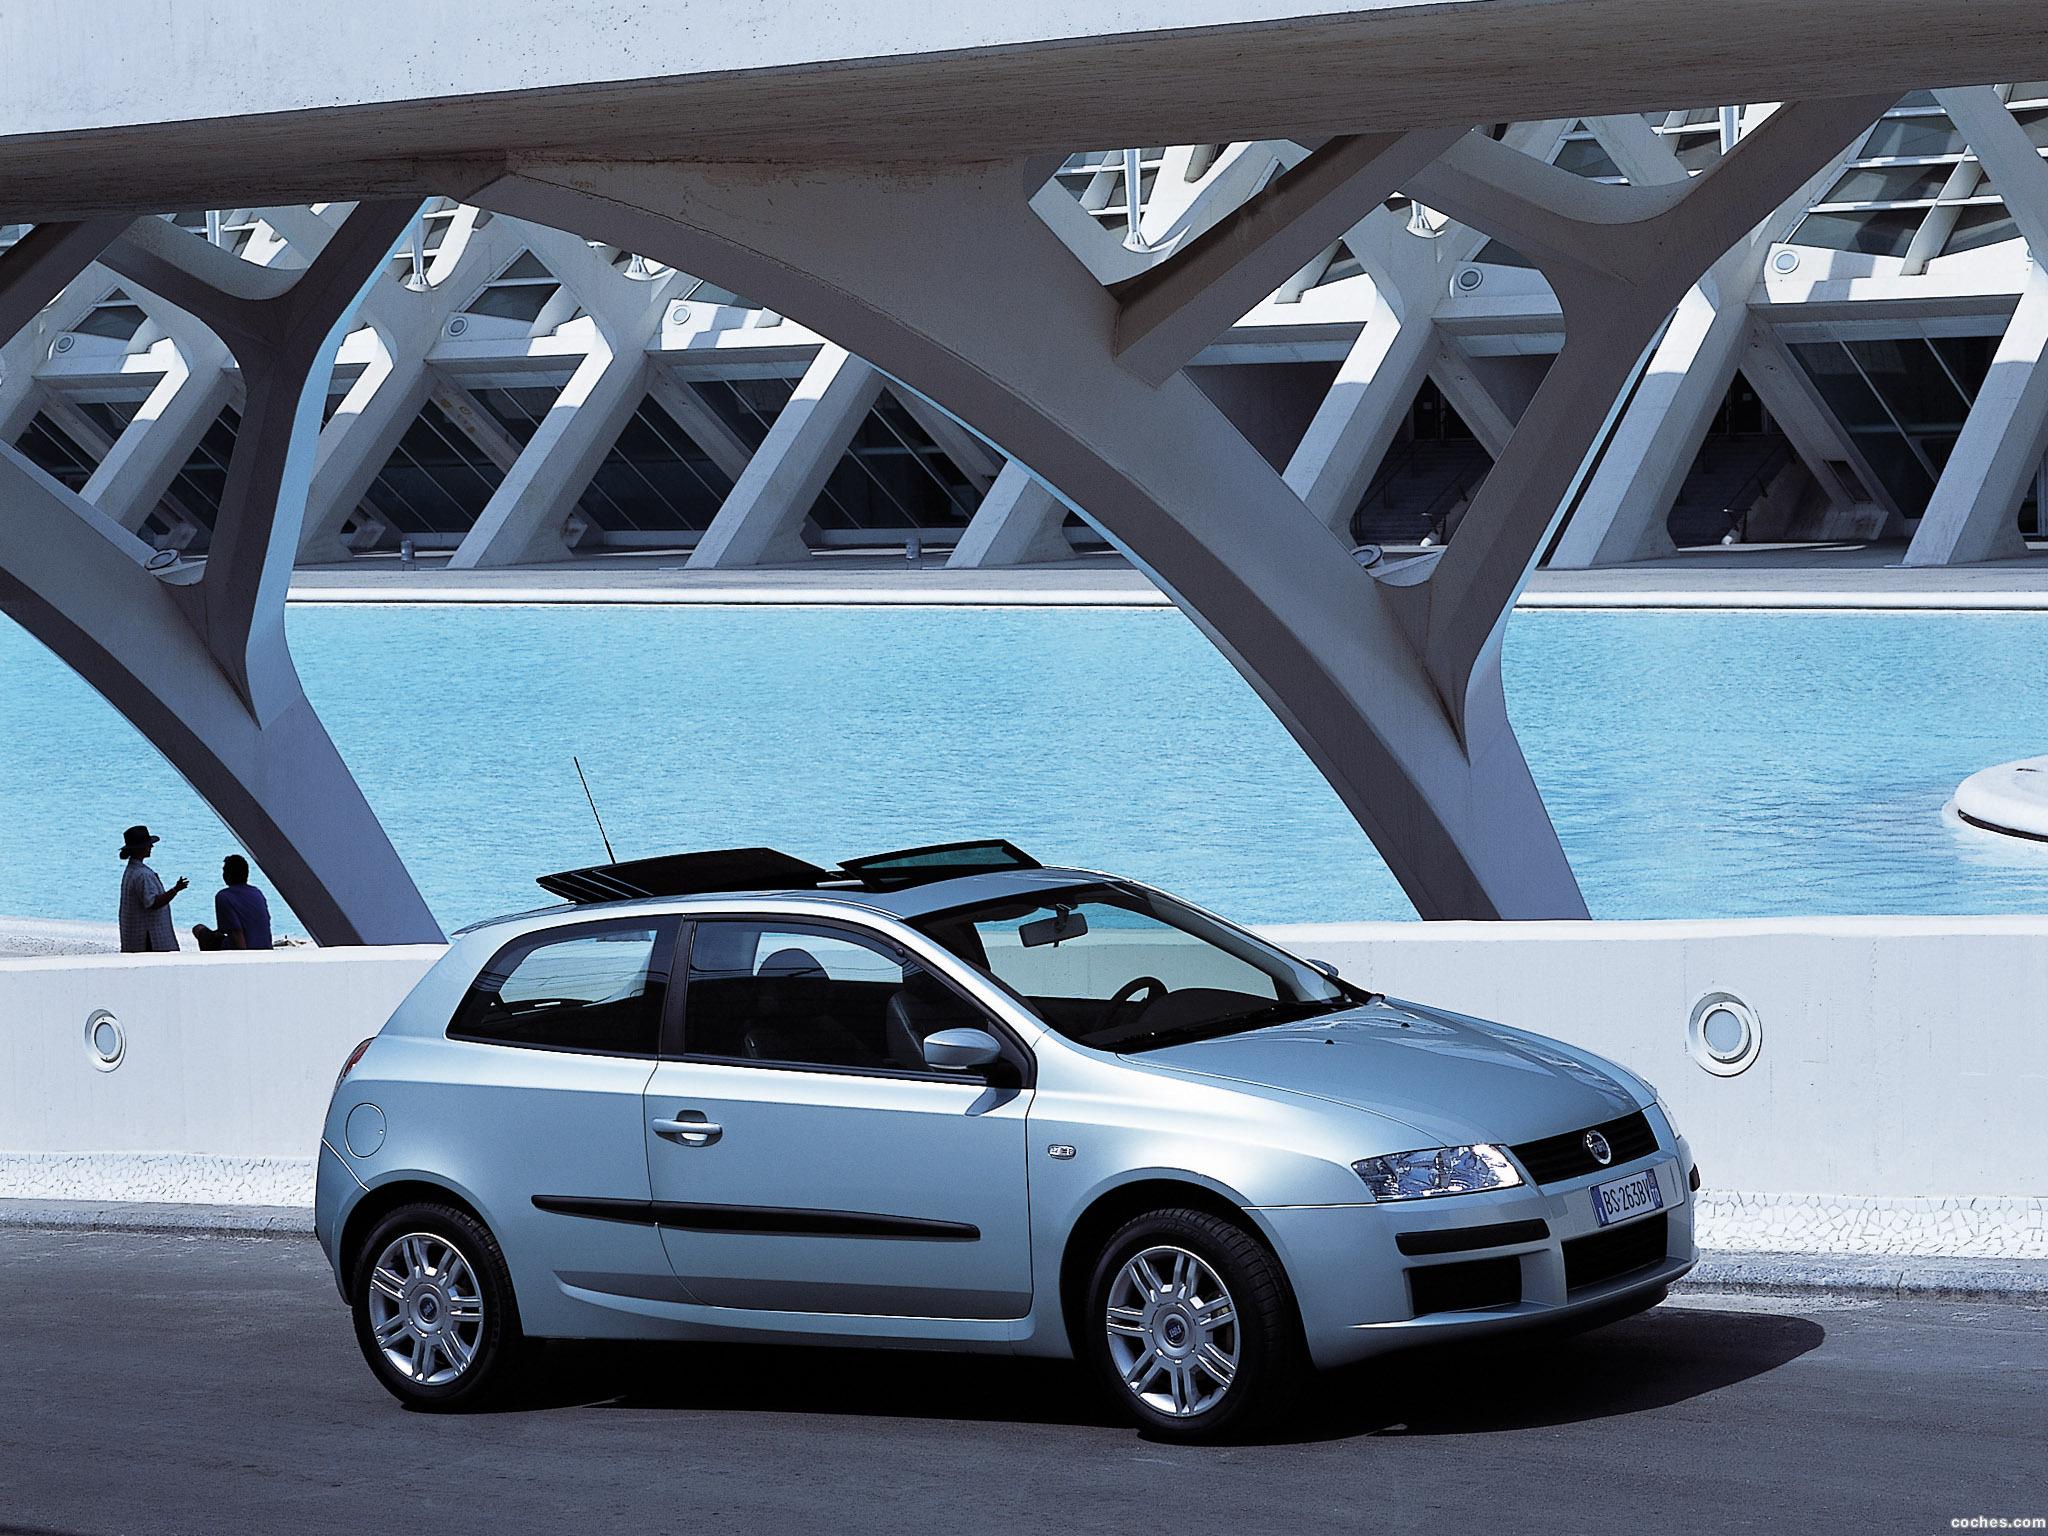 Foto 0 de Fiat Stilo 3 puertas 2001